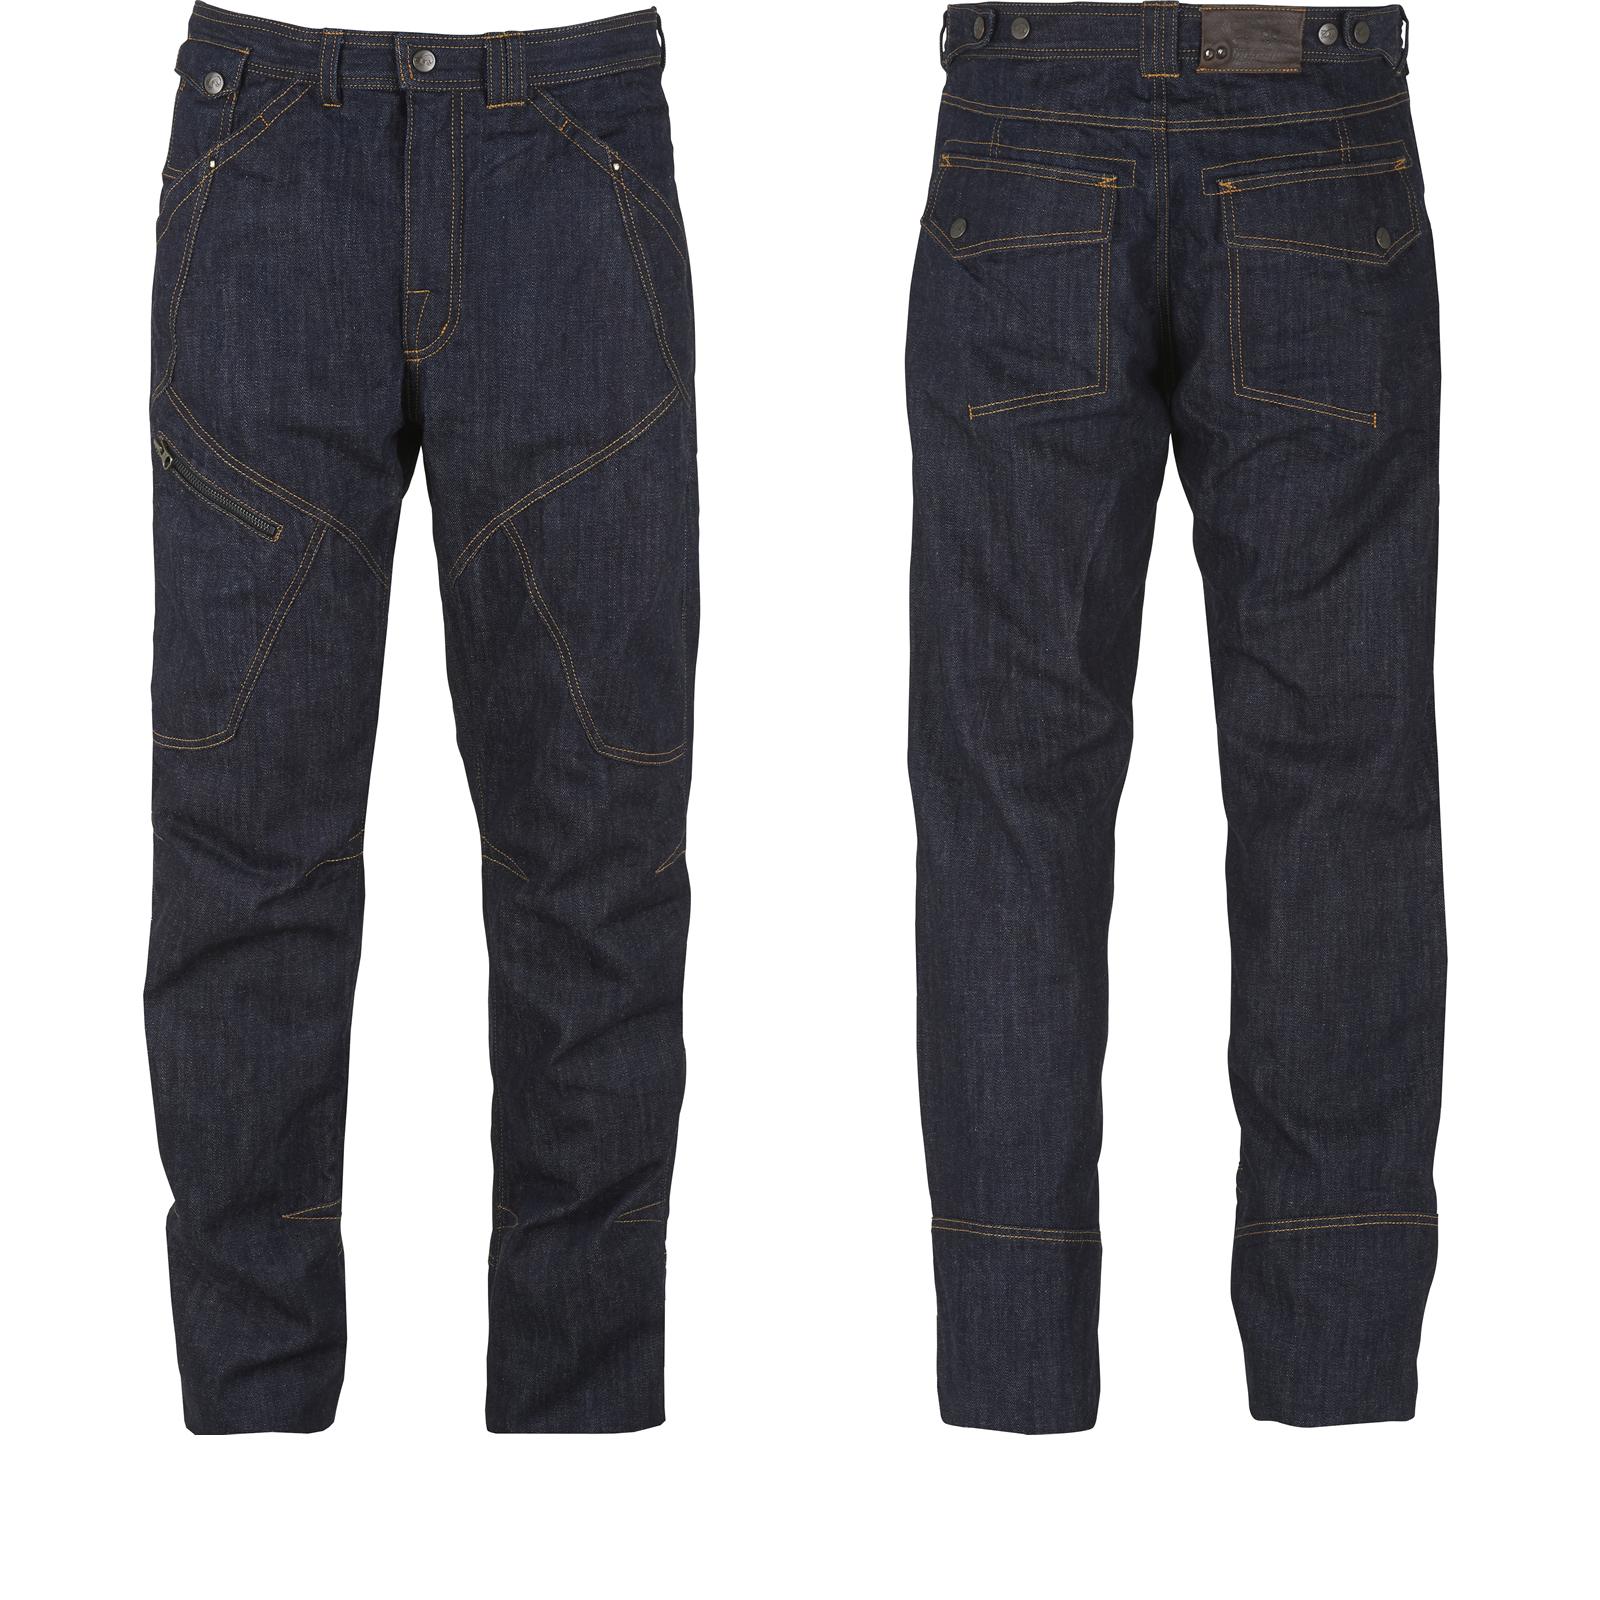 furygan jean d03 blue motorcycle jeans trousers. Black Bedroom Furniture Sets. Home Design Ideas